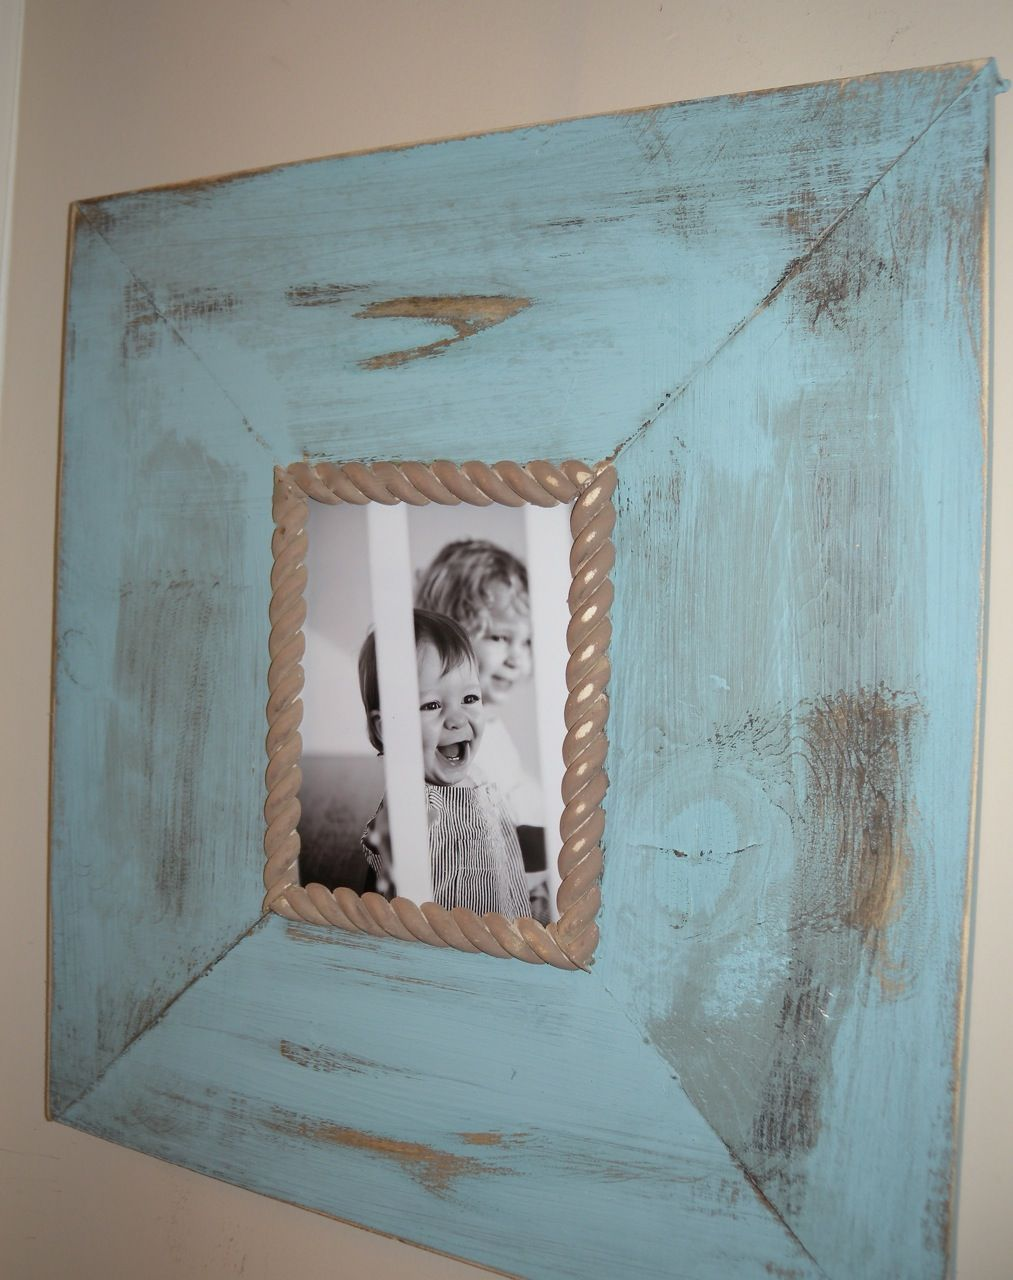 distressed wood frames delta girl distressed frames uber distressed frames - Distressed Wood Frames